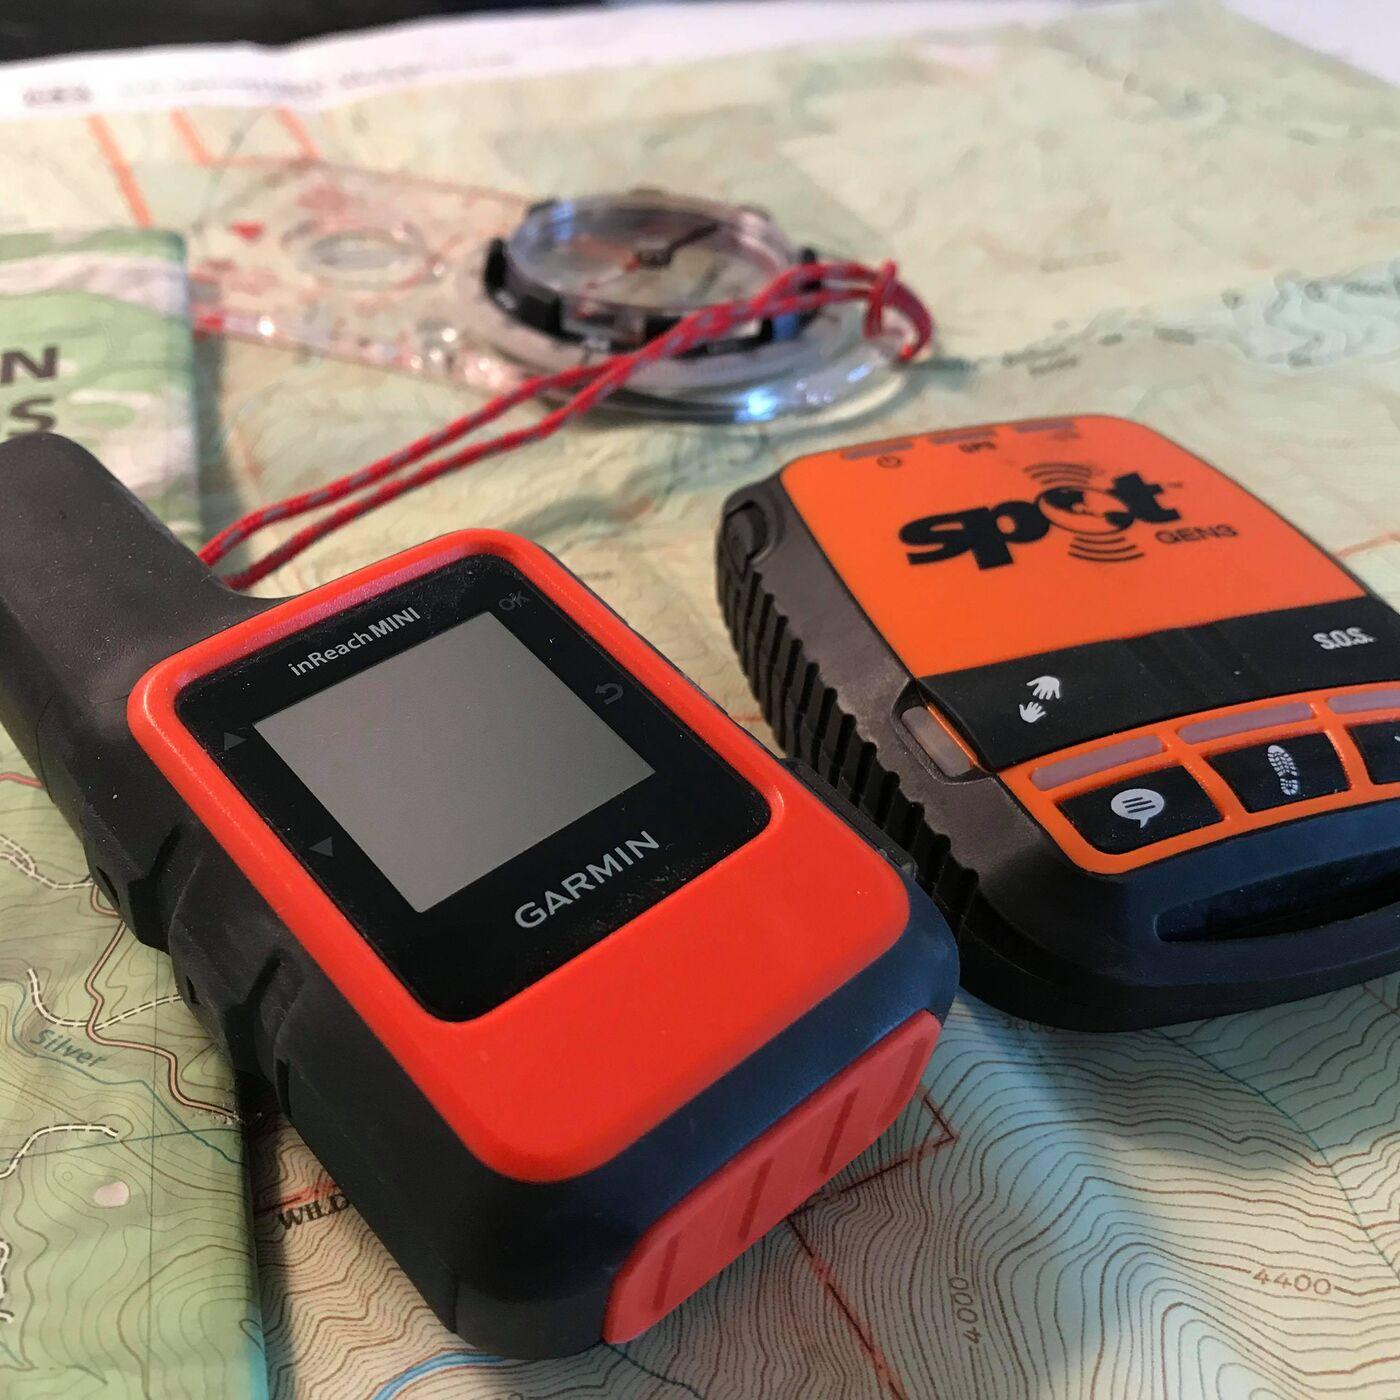 First 99 Gear Review - Spot vs. Garmin GPS trackers